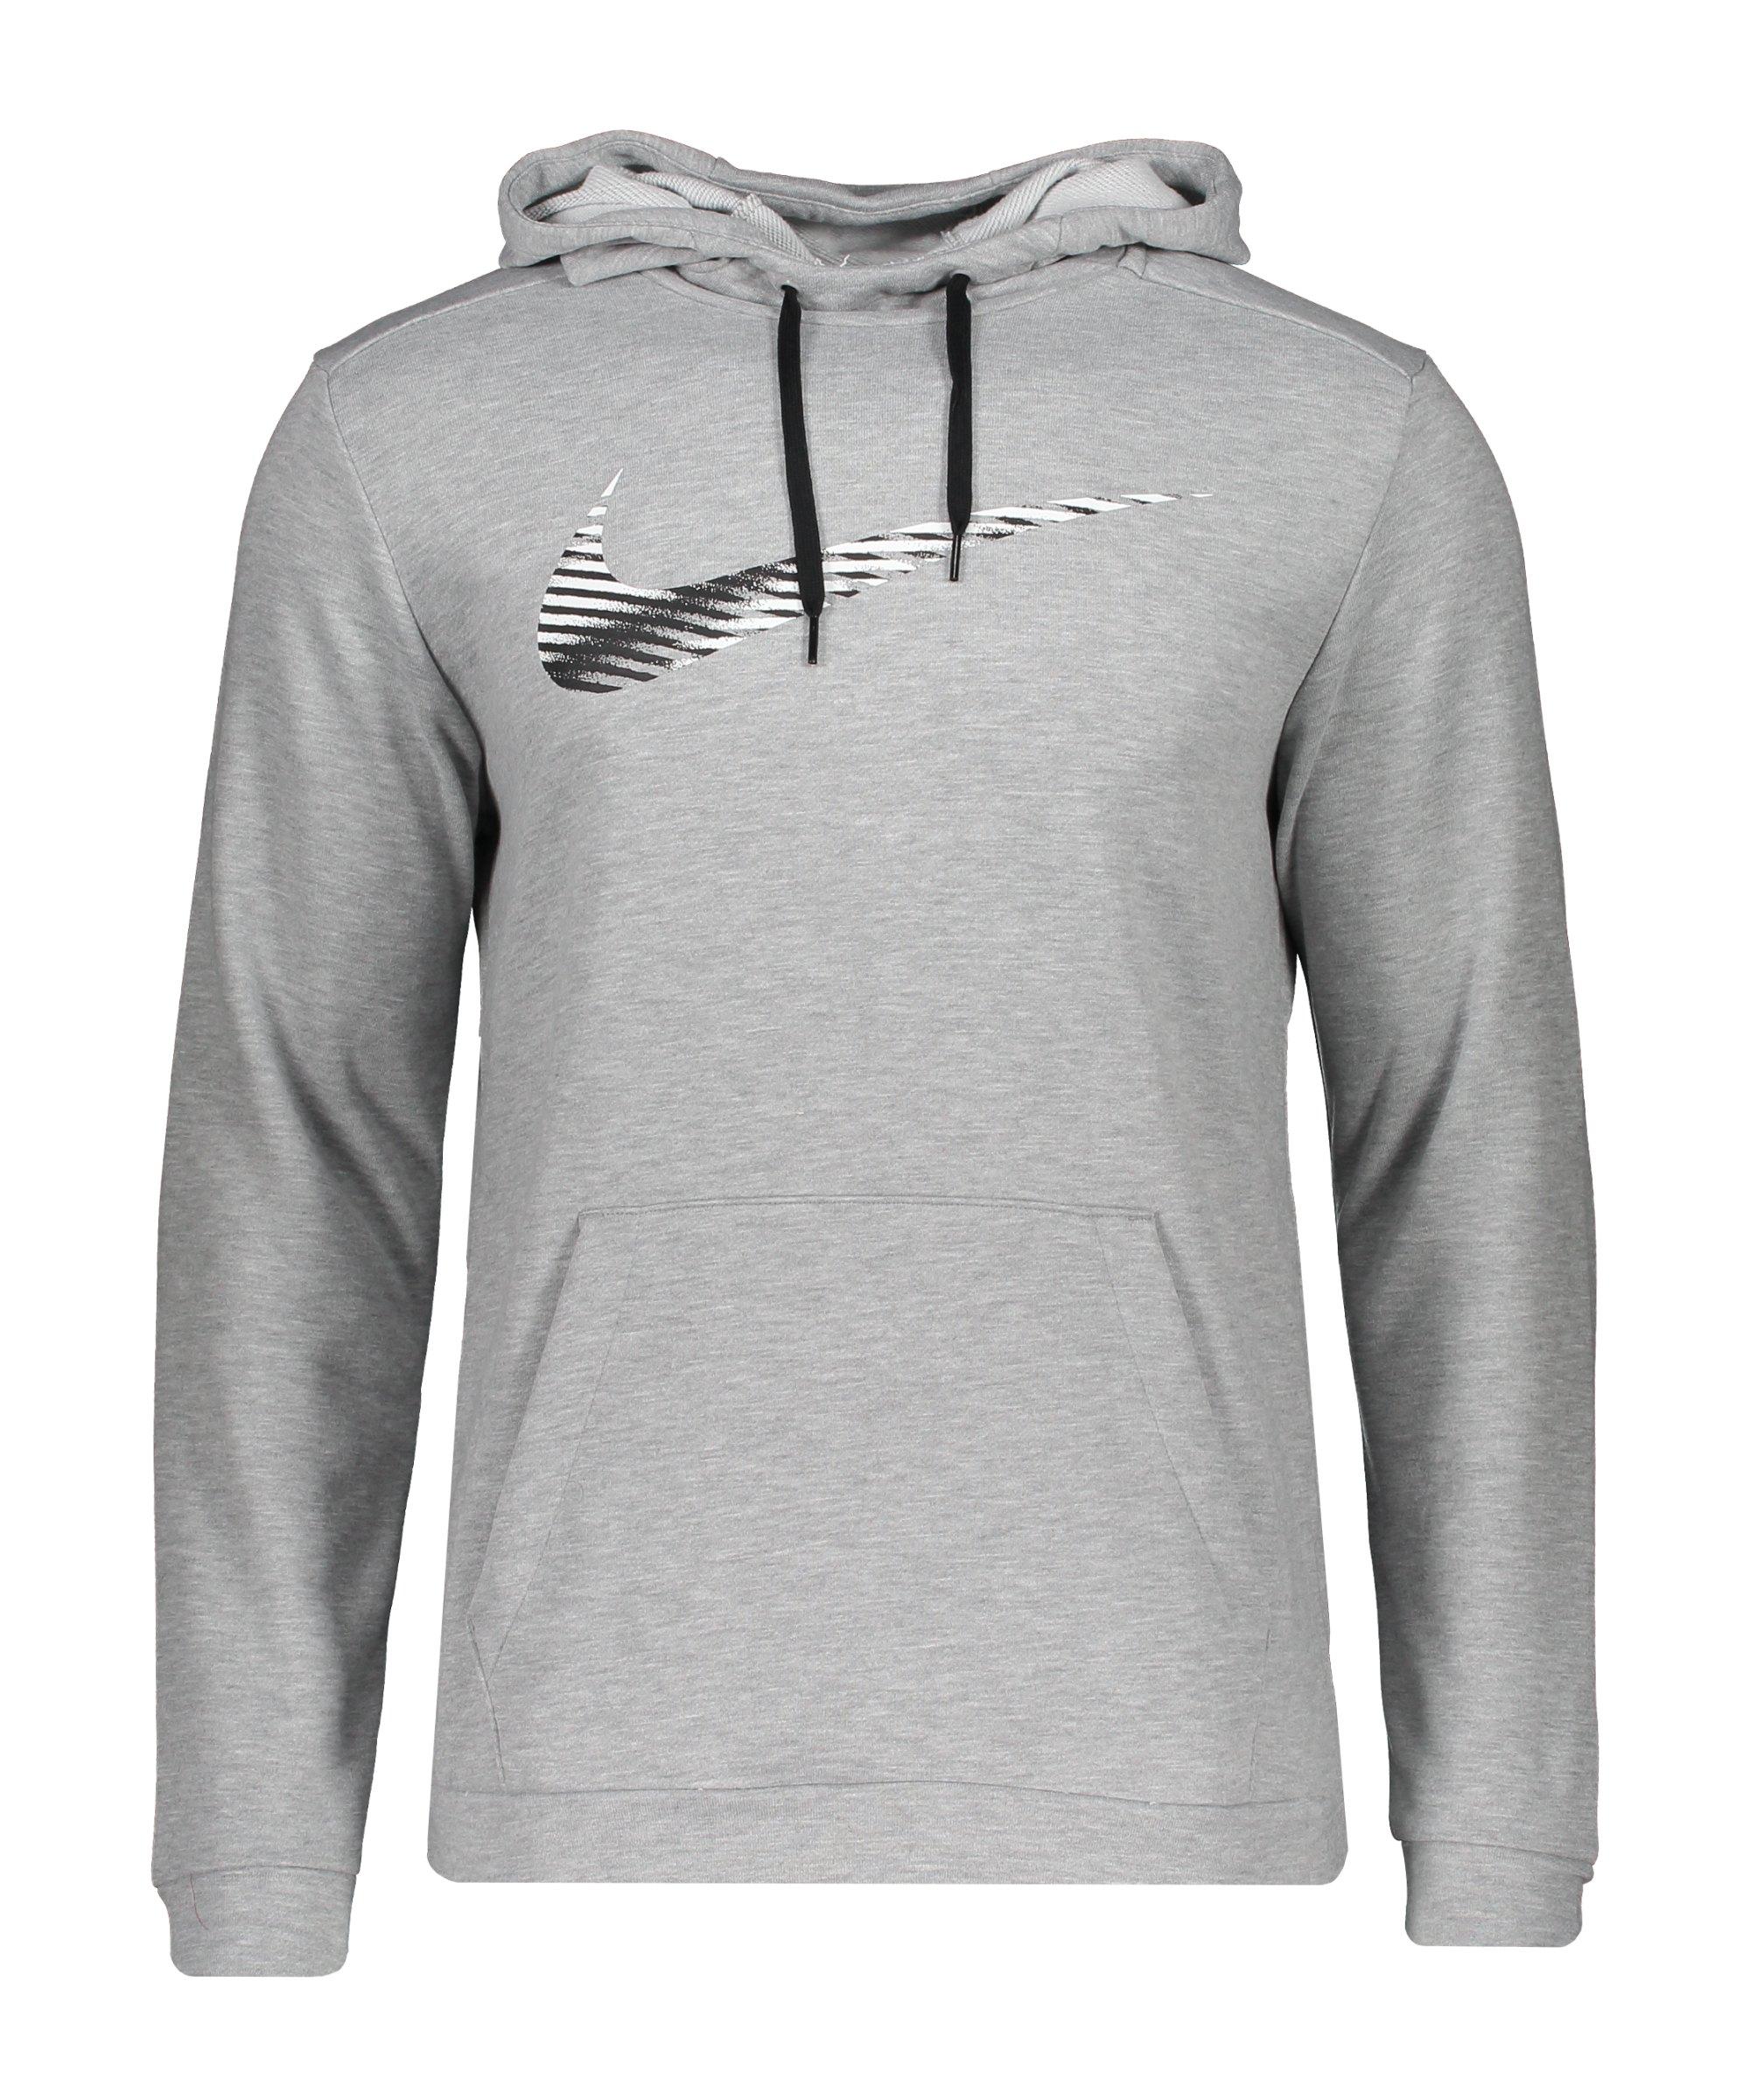 Nike Swoosh Kapuzenpullover Grau F063 - grau